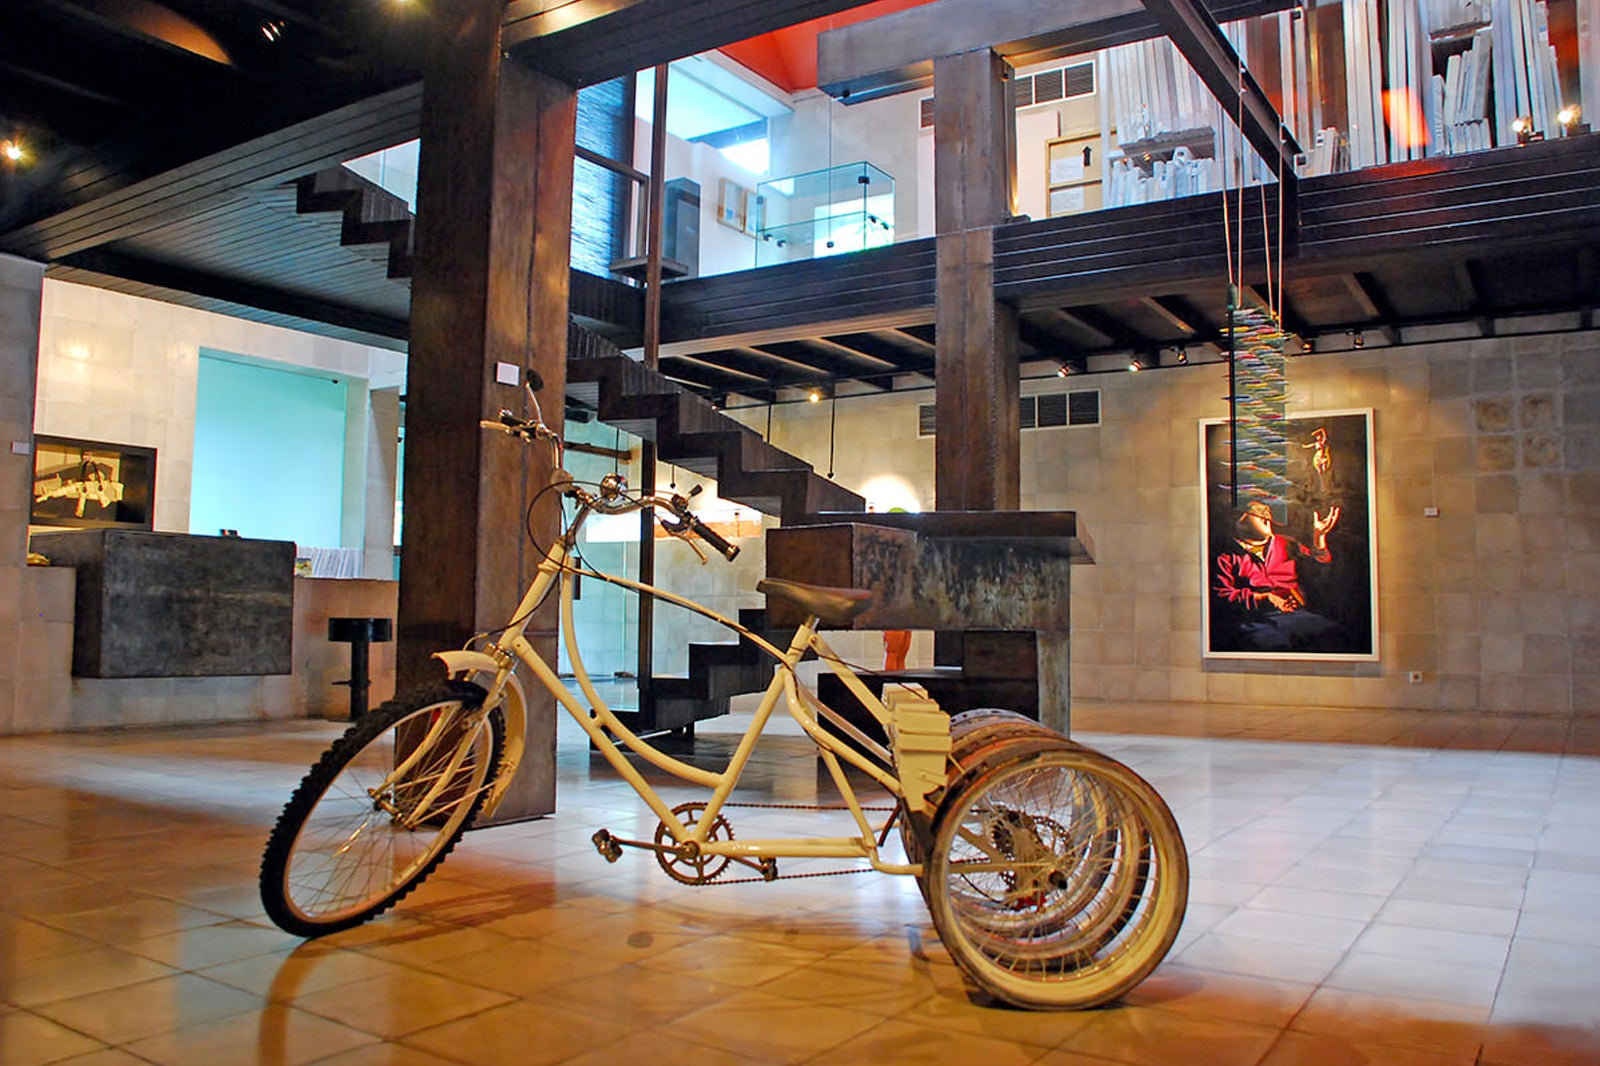 Jalan Raya Seminyak In Bali Seminyak Shopping And Walking Street